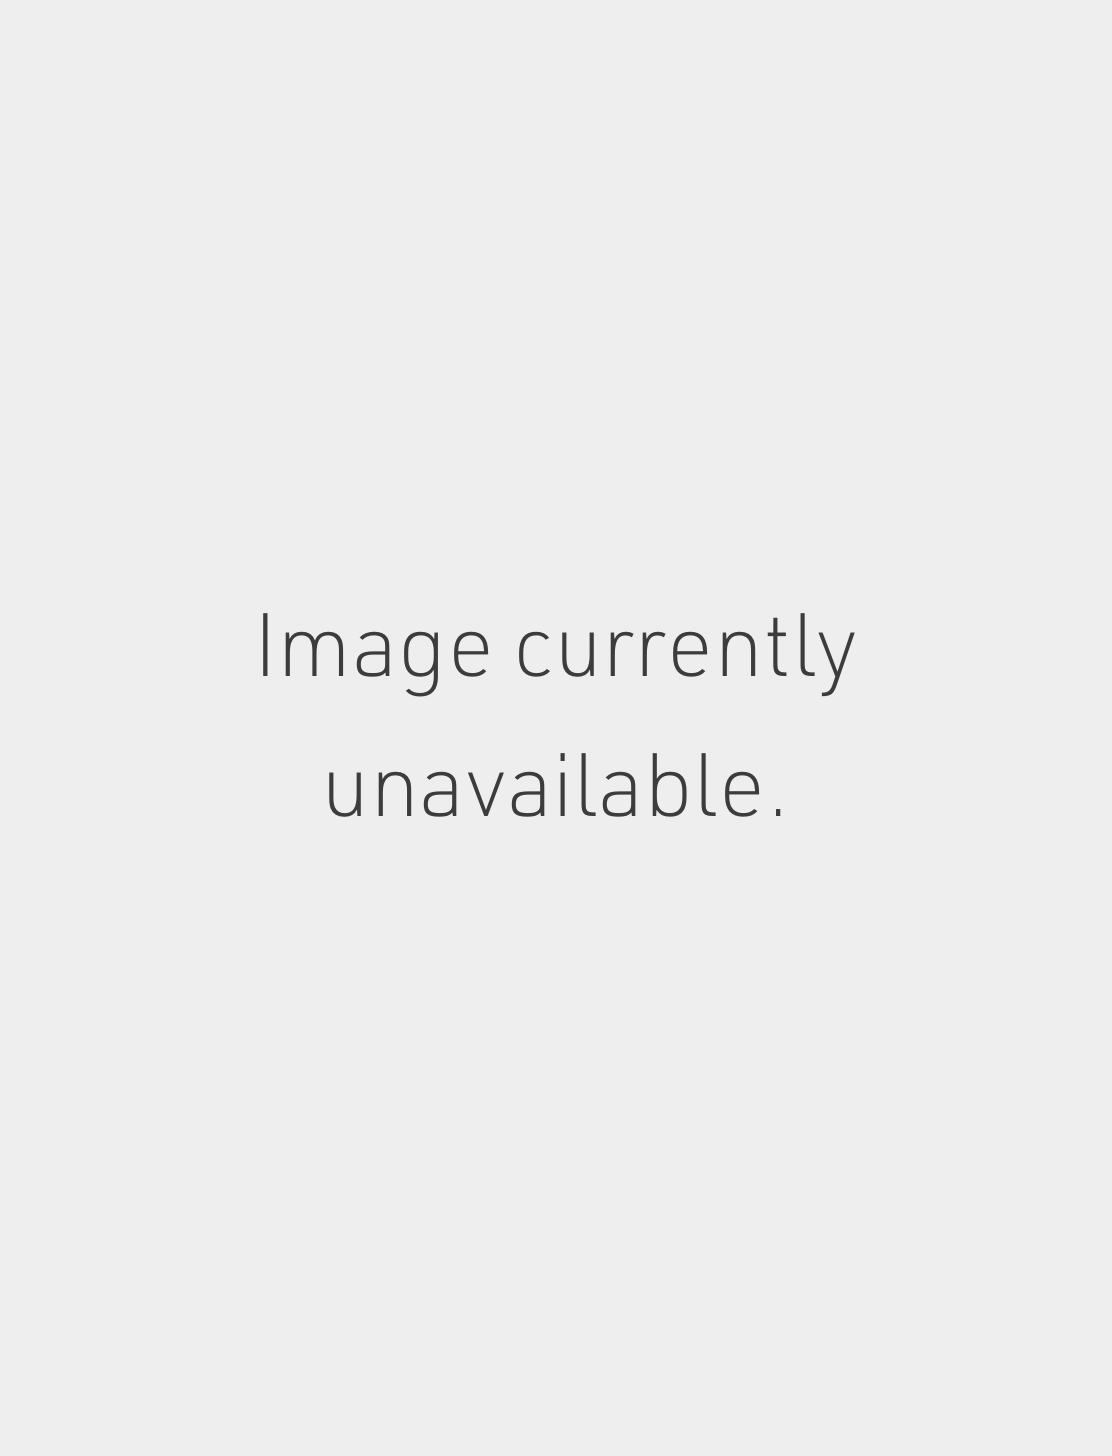 "14k Gold 16g 5/16"" Double Sided Hiranya Image #1"